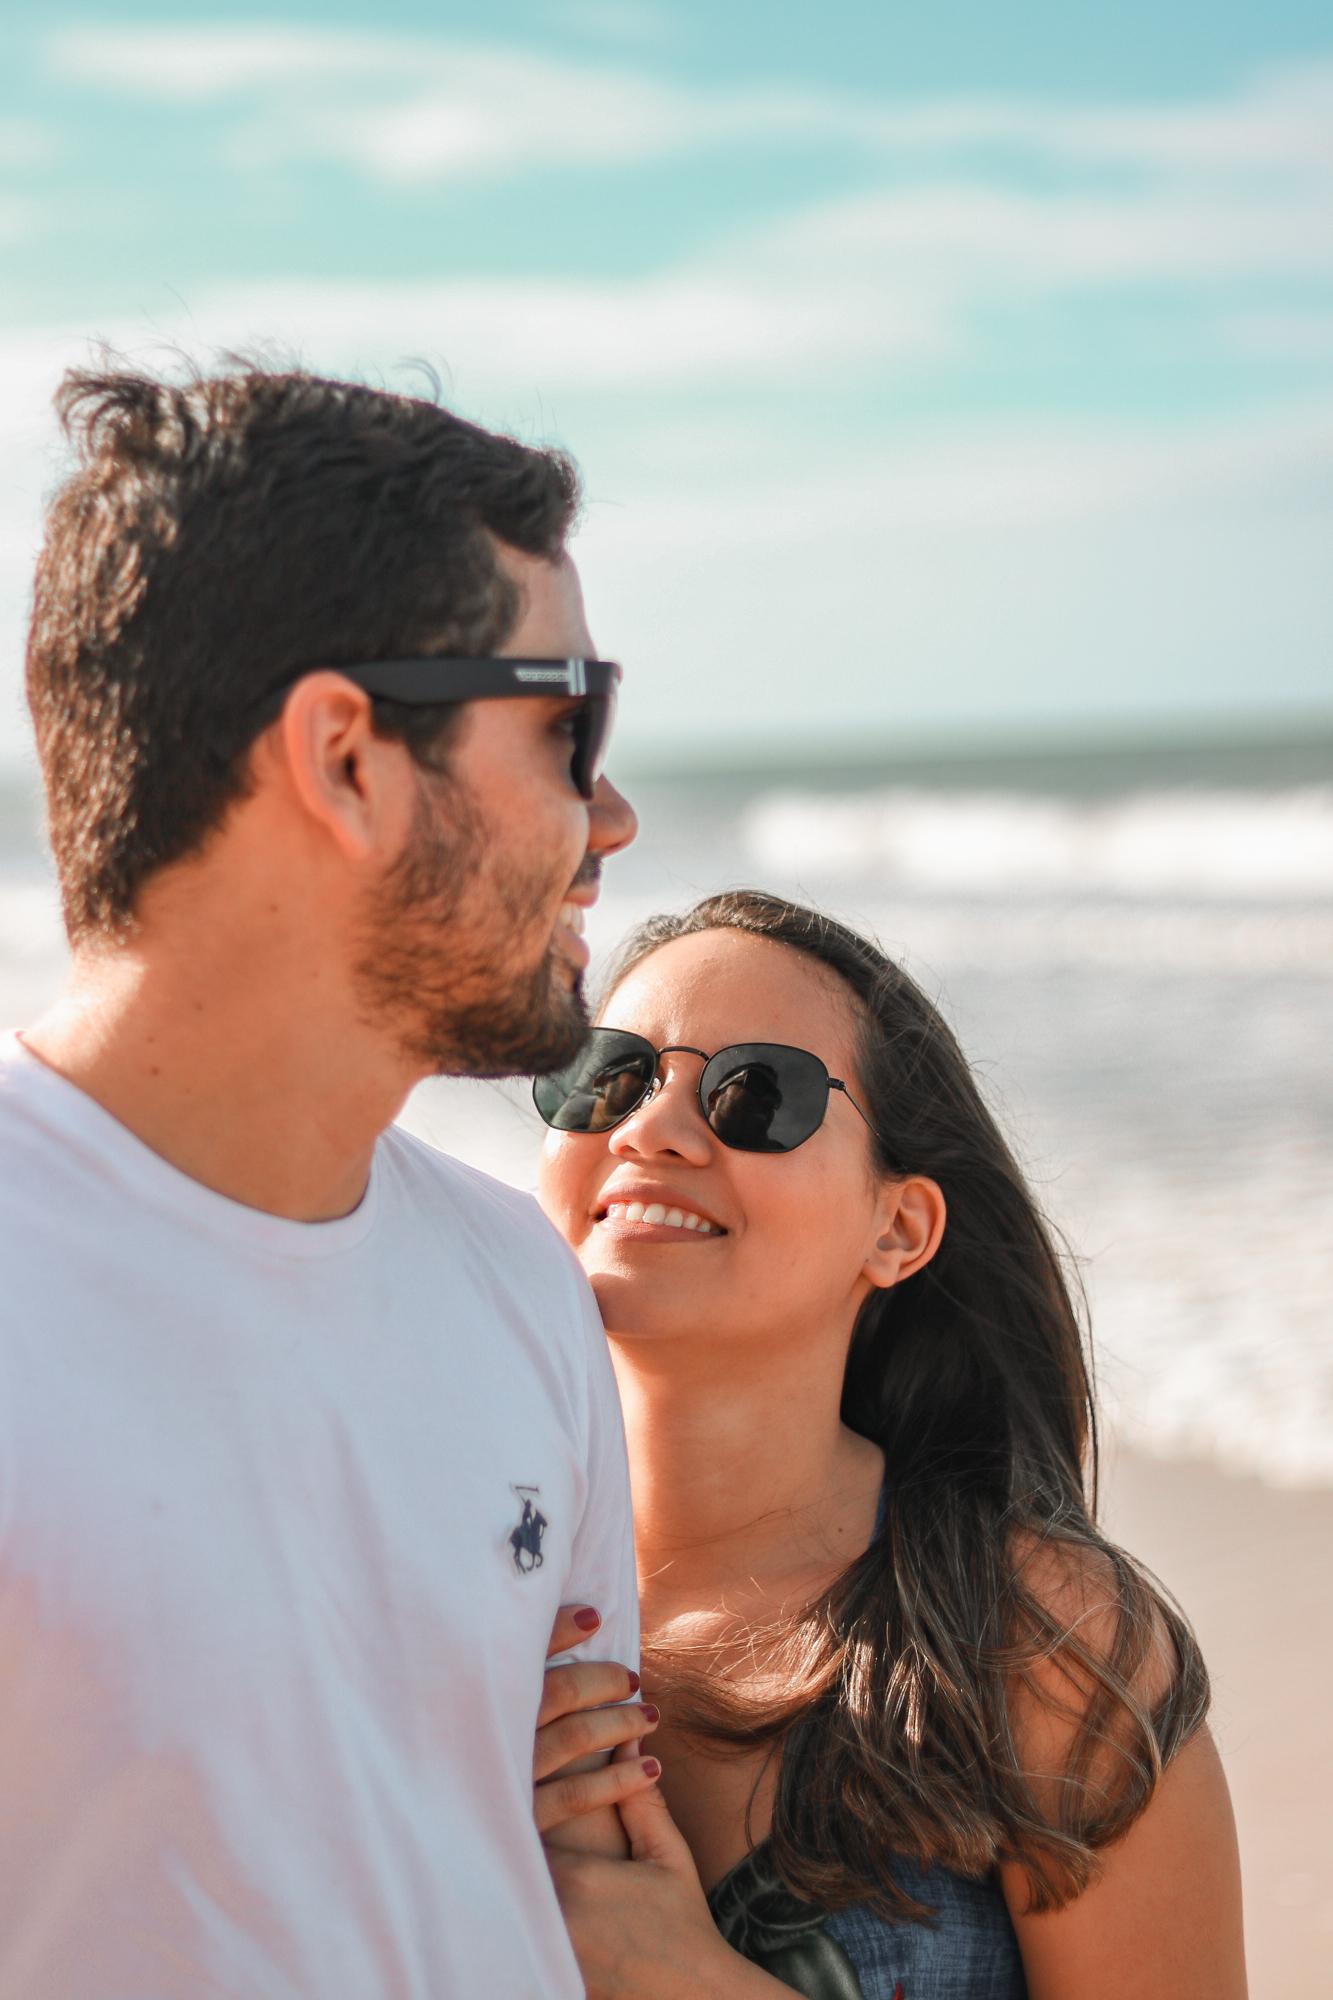 Dating engagerade flicka Spokane dating